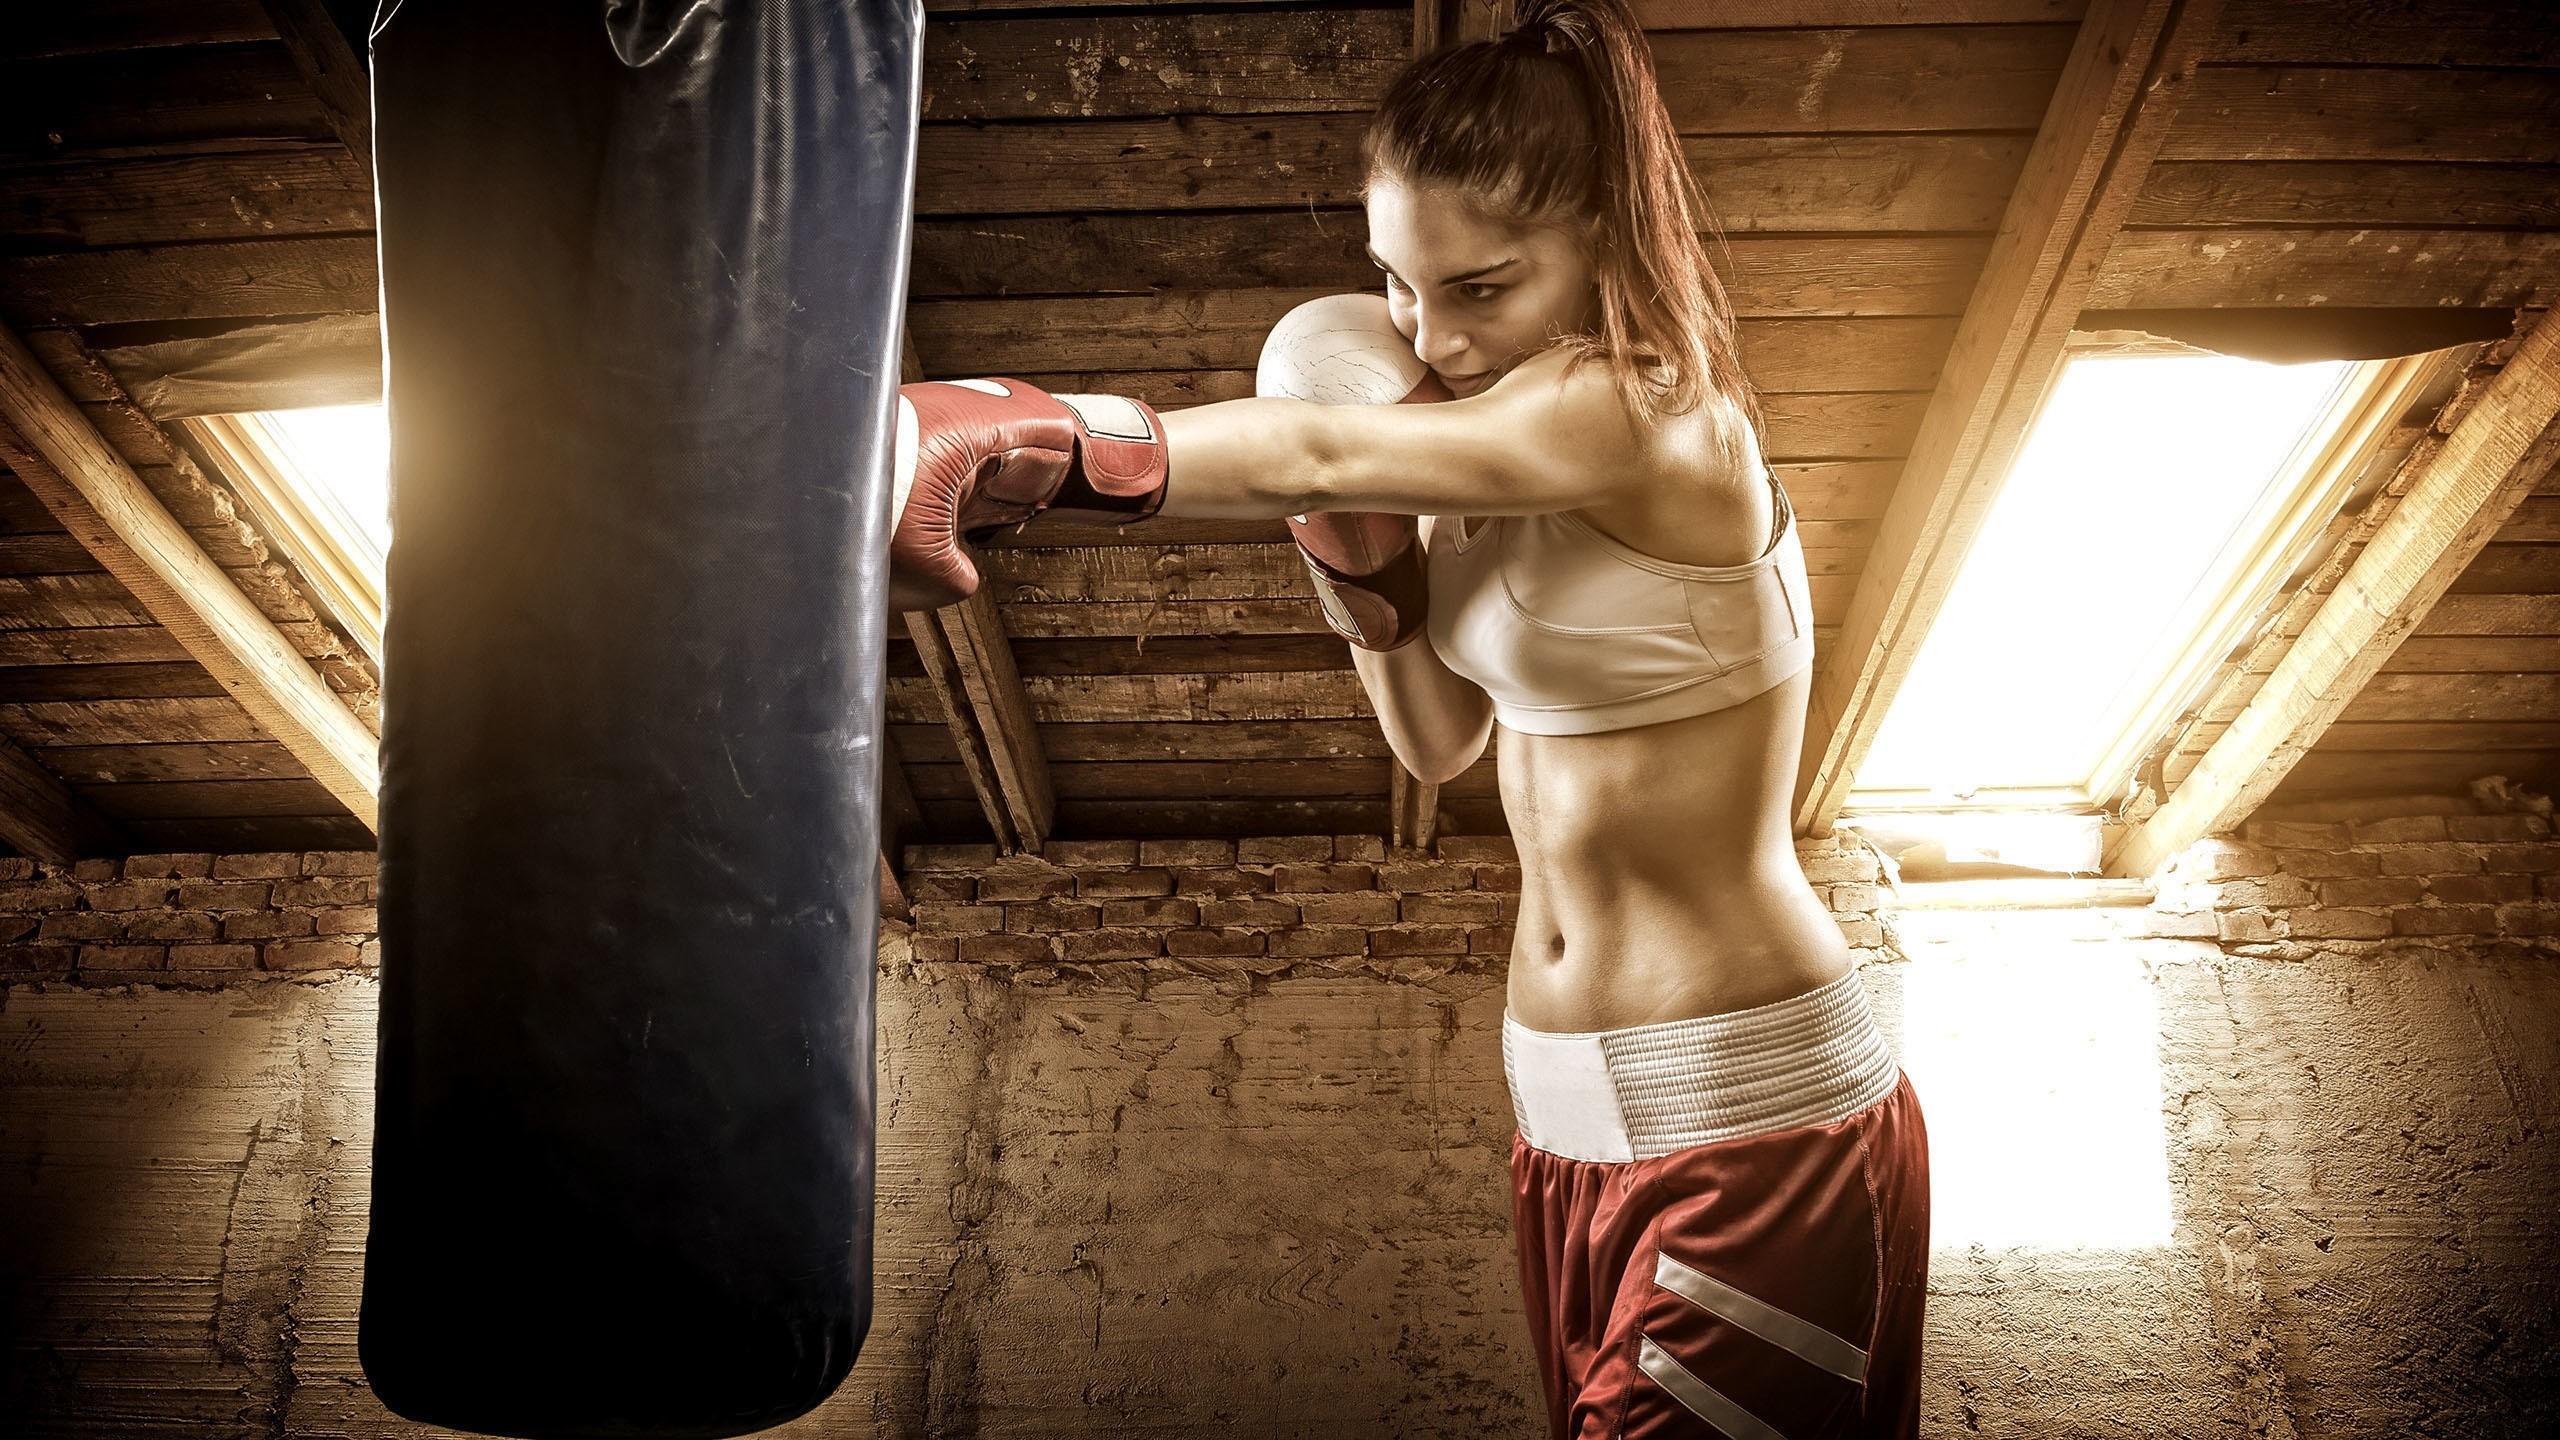 Lifestyle / Boxing Wallpaper